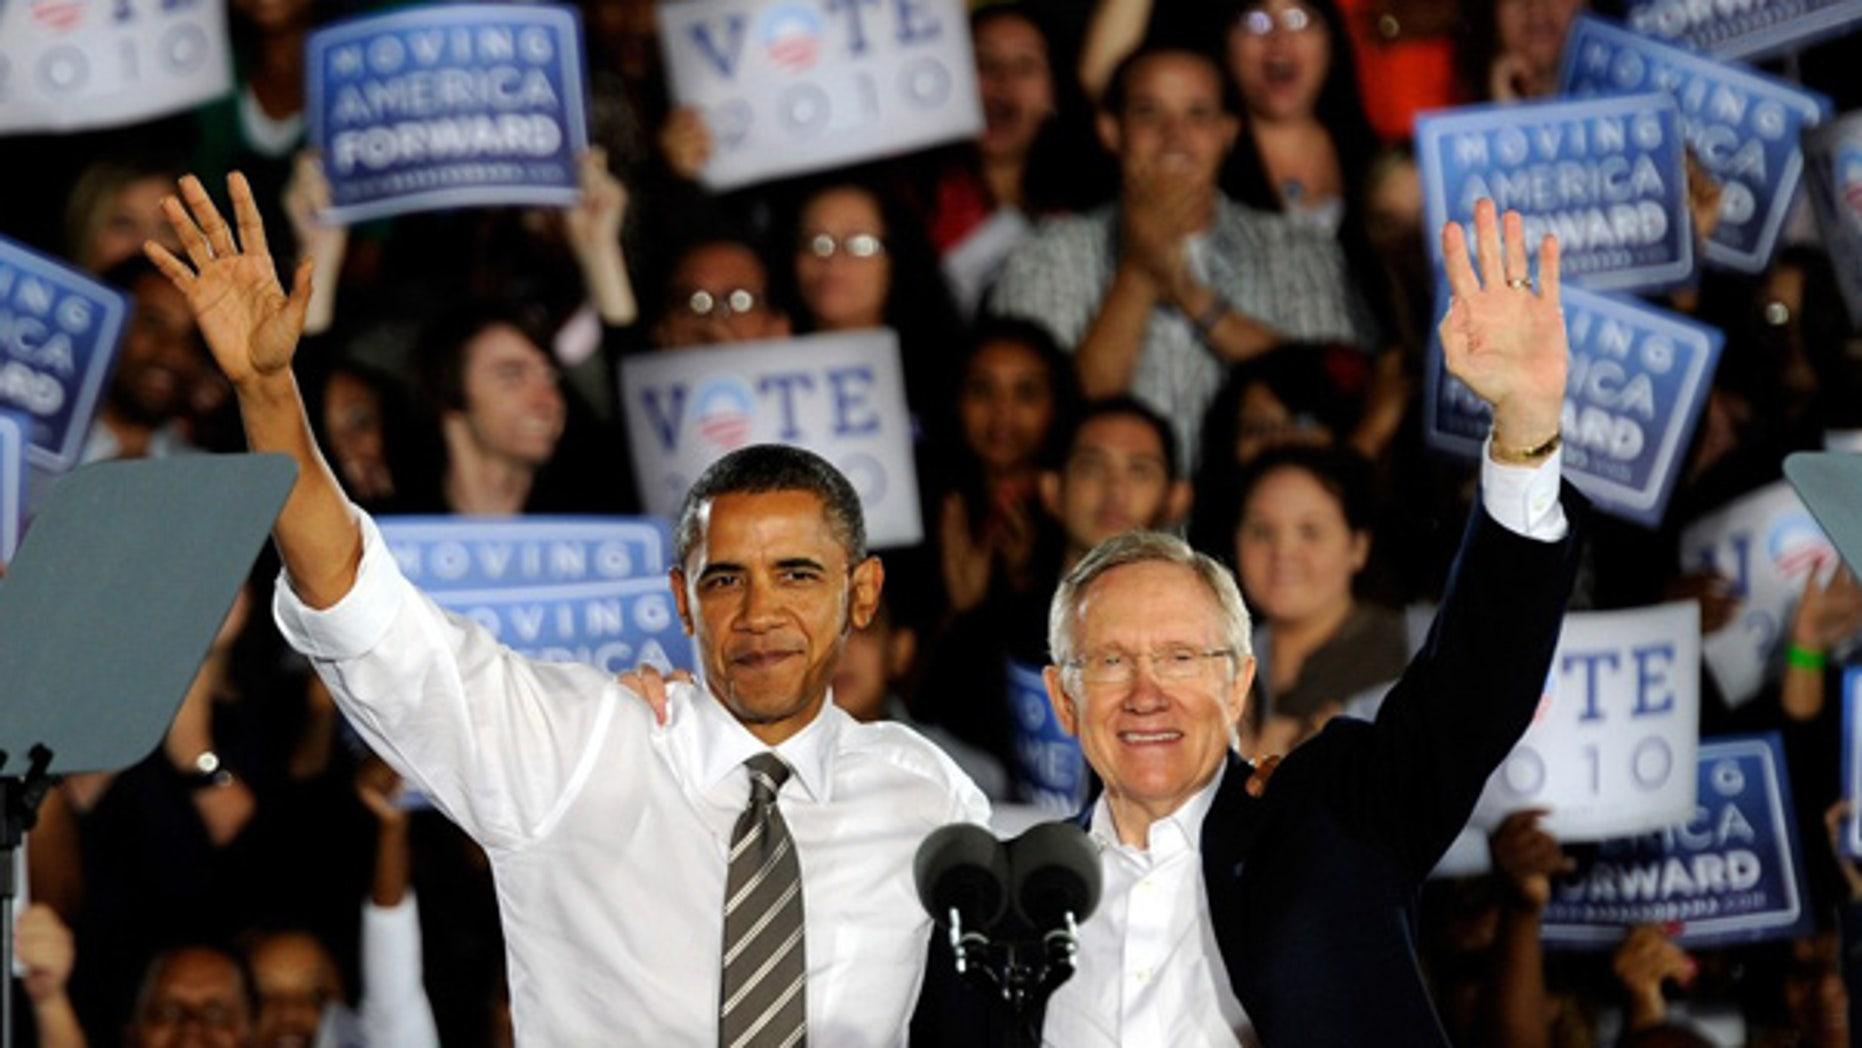 Oct. 22: President Obama campaigns with Senate Majority Leader Harry Reid in Las Vegas.